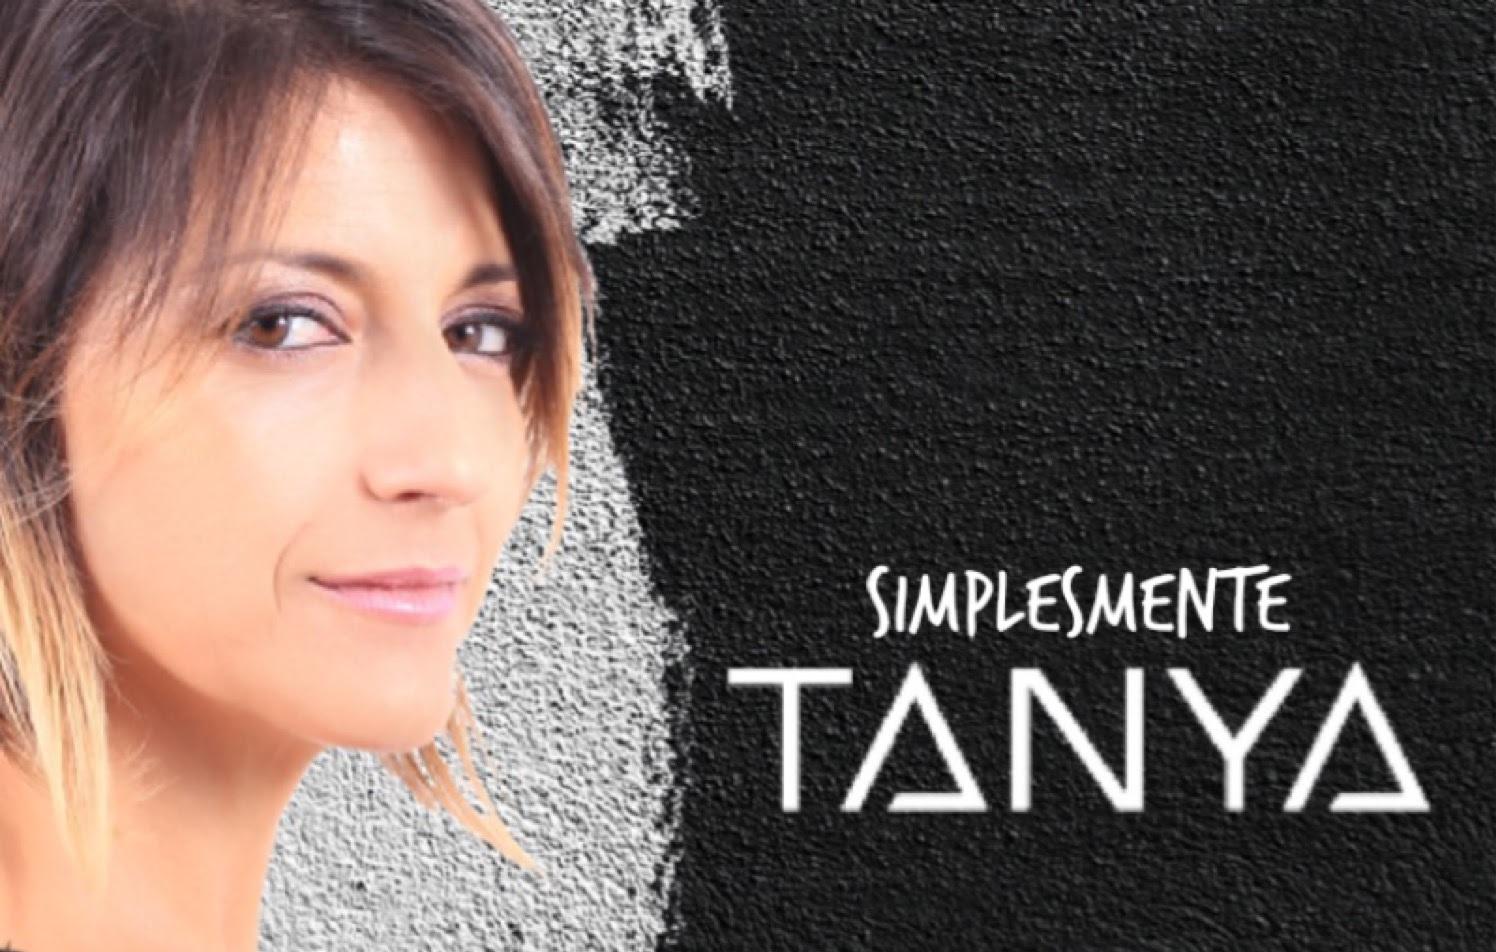 Tanya uma Ribatejana que nasceu para a musica